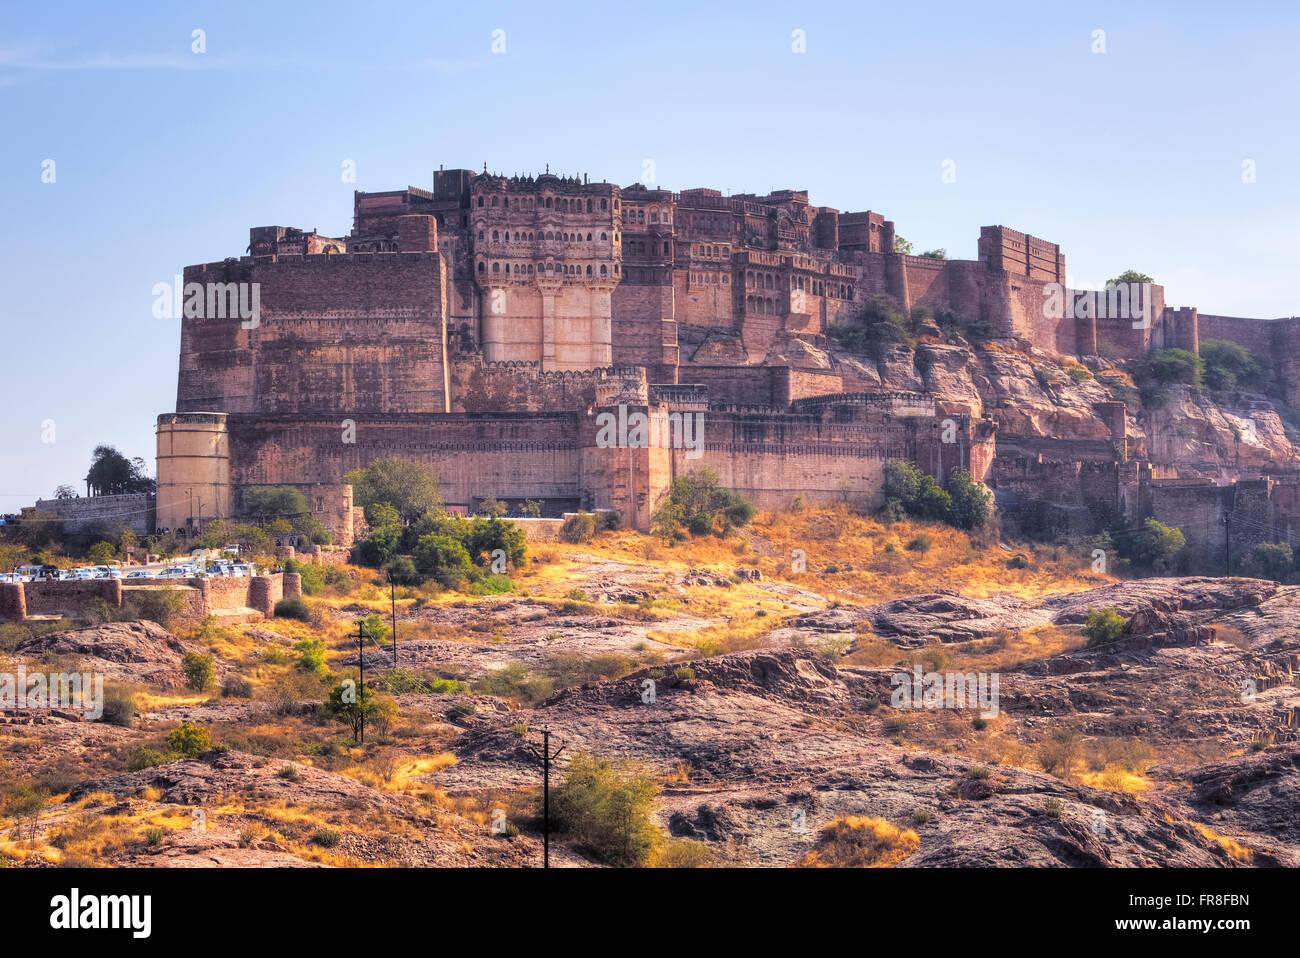 Mehrangarh Fort, Jodhpur, Rajasthan, India, Asia - Stock Image